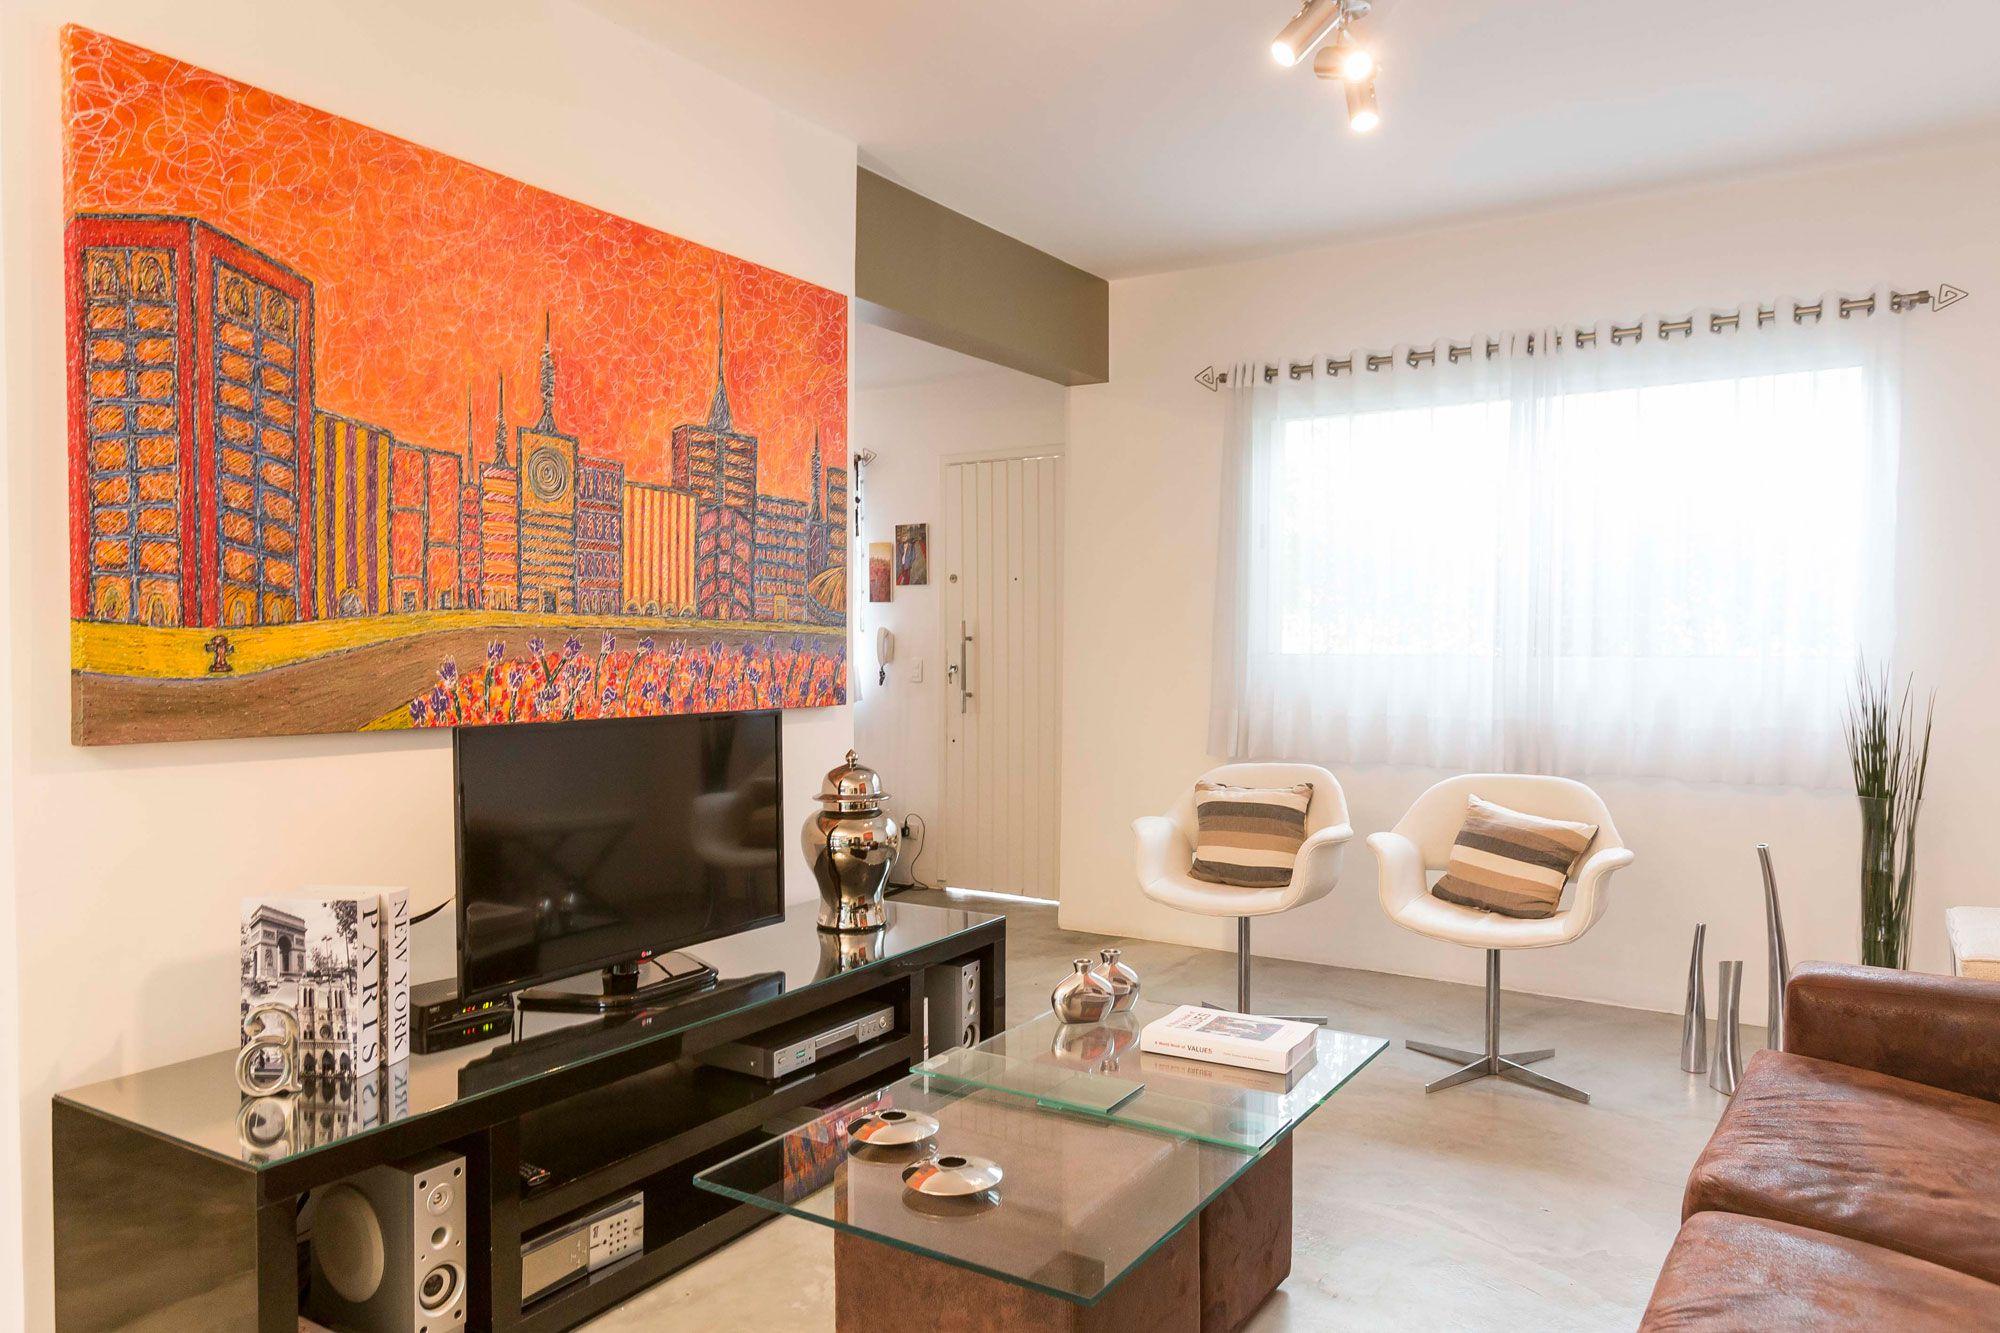 Granja-Julieta-Residence-15